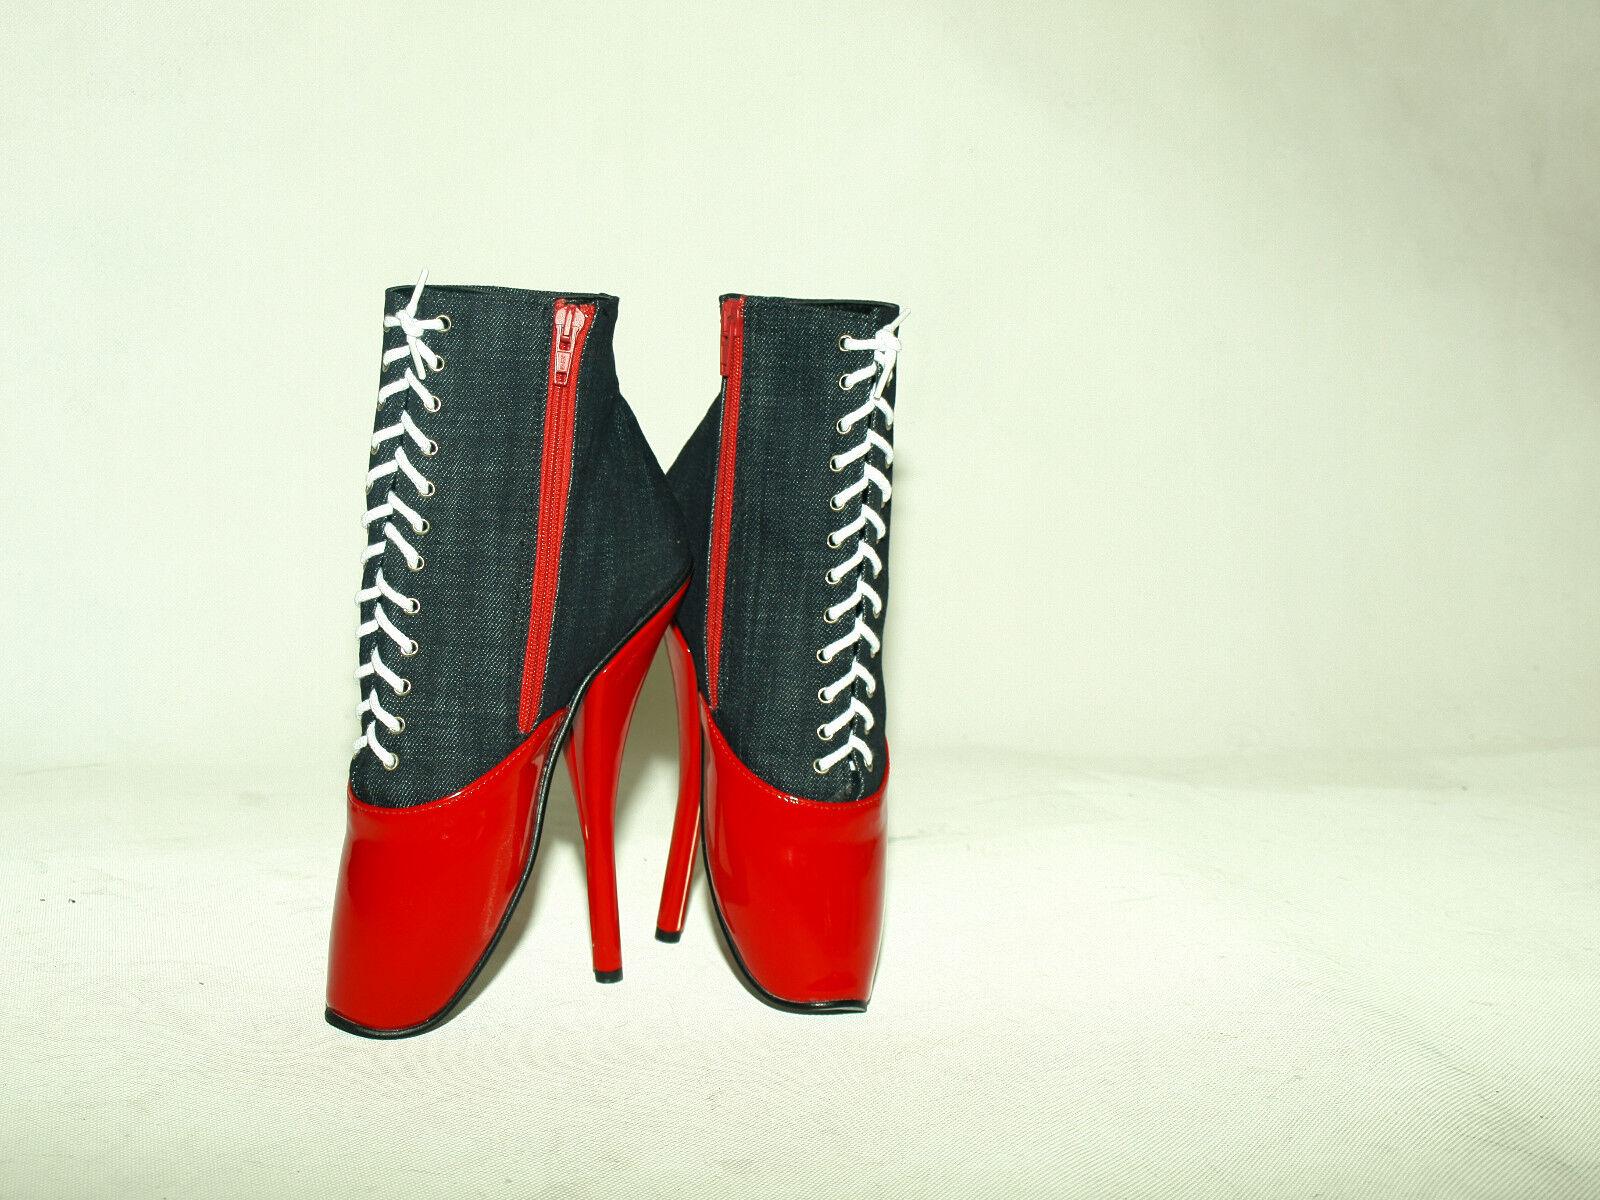 High heels stiefel  lack 37-47 pu-jeans ballet  Größe 37-47 lack  heel 20cm  POLAND-produkt b4c08b